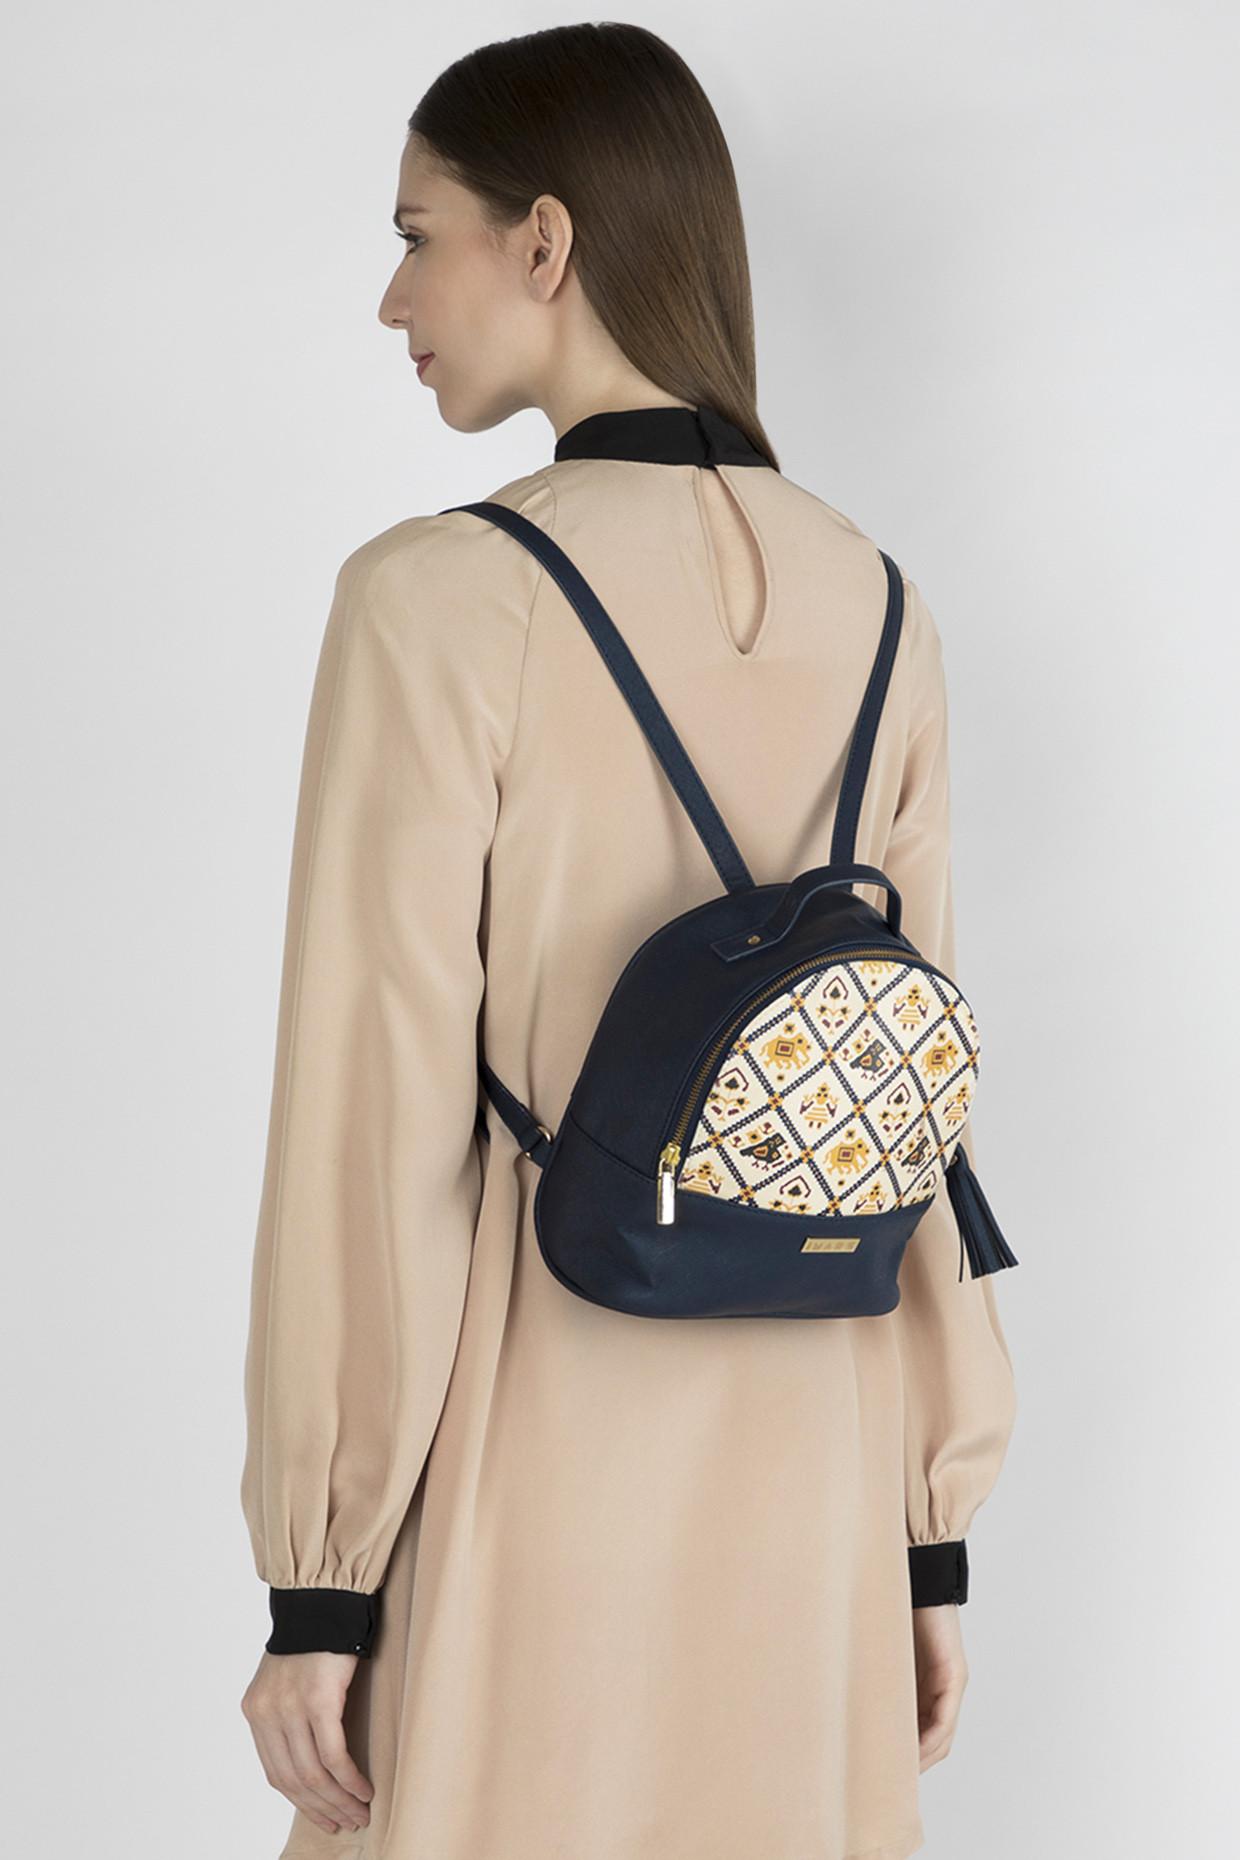 Blue Multi Functional Backpack by Imars